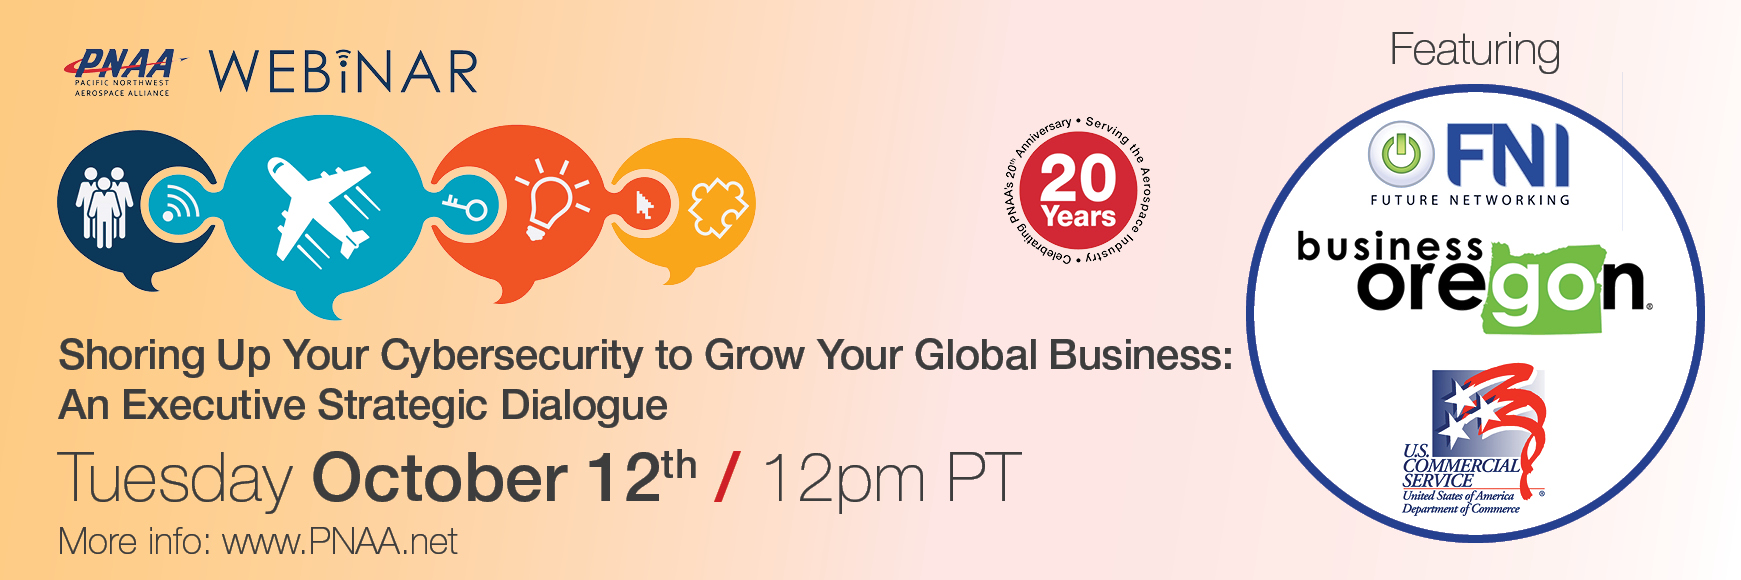 PNAA_Webinar_Shoring_Up_Your_Cybersecurity_to_Grow_Your_Global_Business